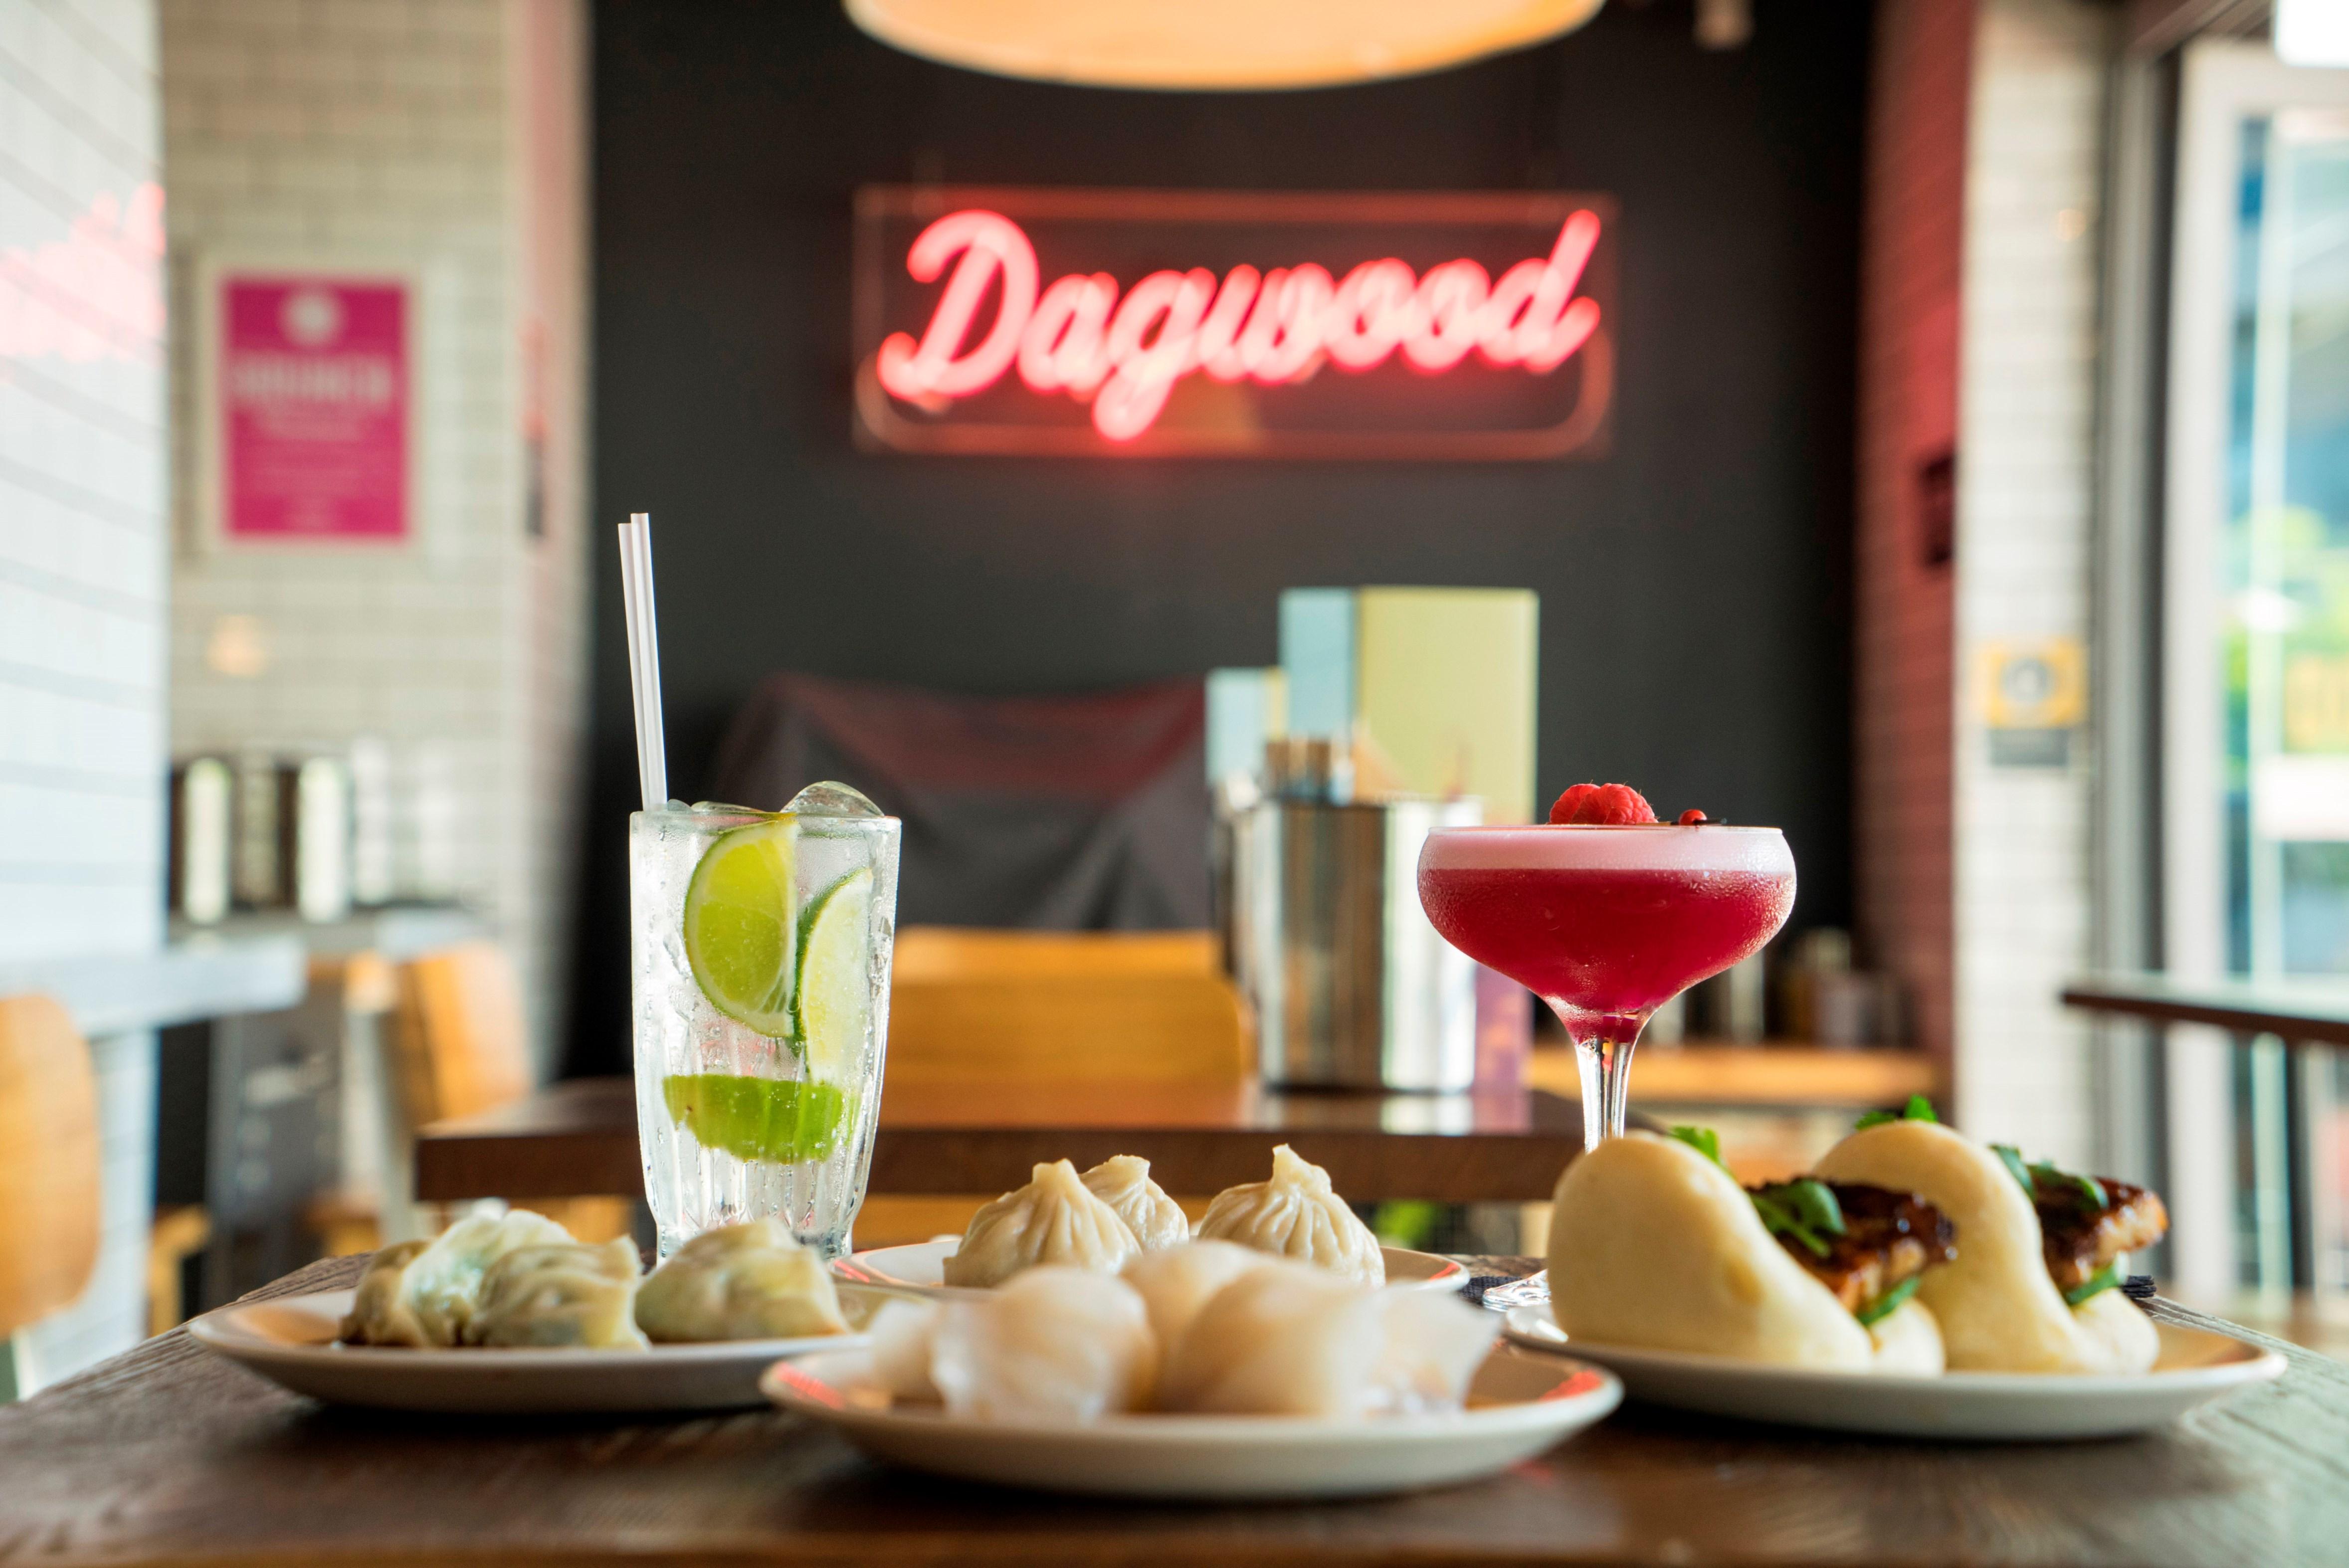 Dagwood-DeeKramer-101